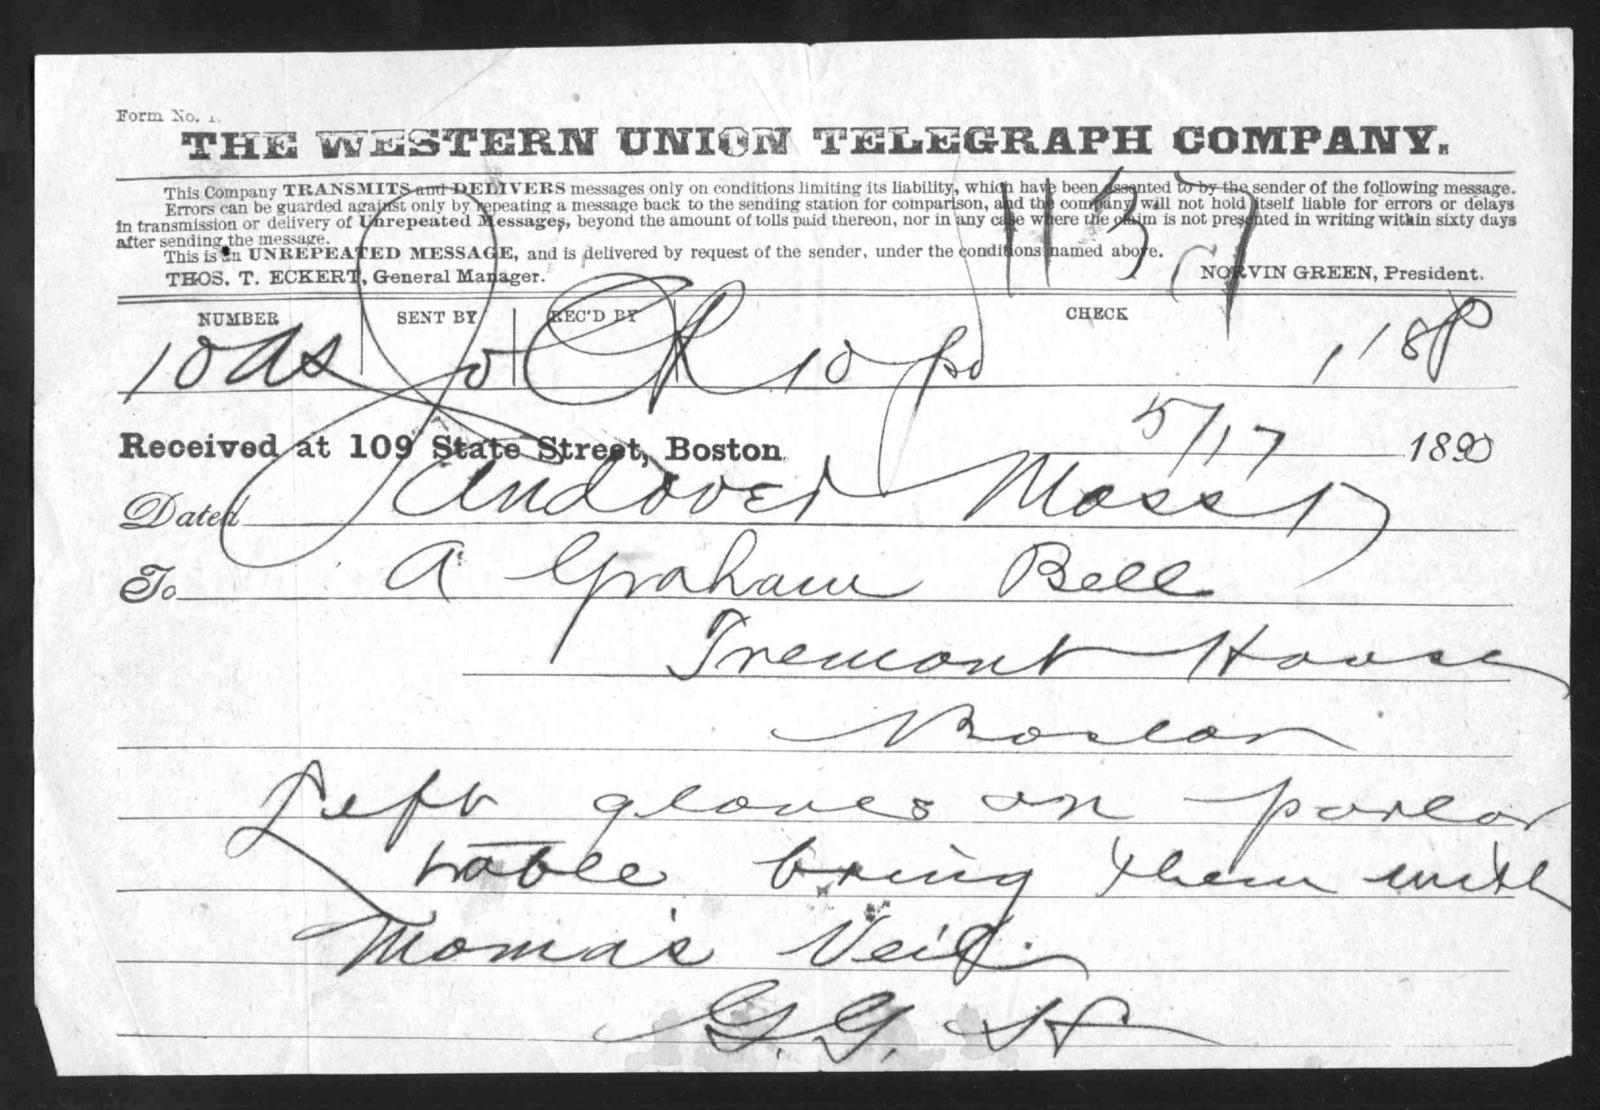 Telegram from Gardiner Greene Hubbard to Alexander Graham Bell, May 17, 1890